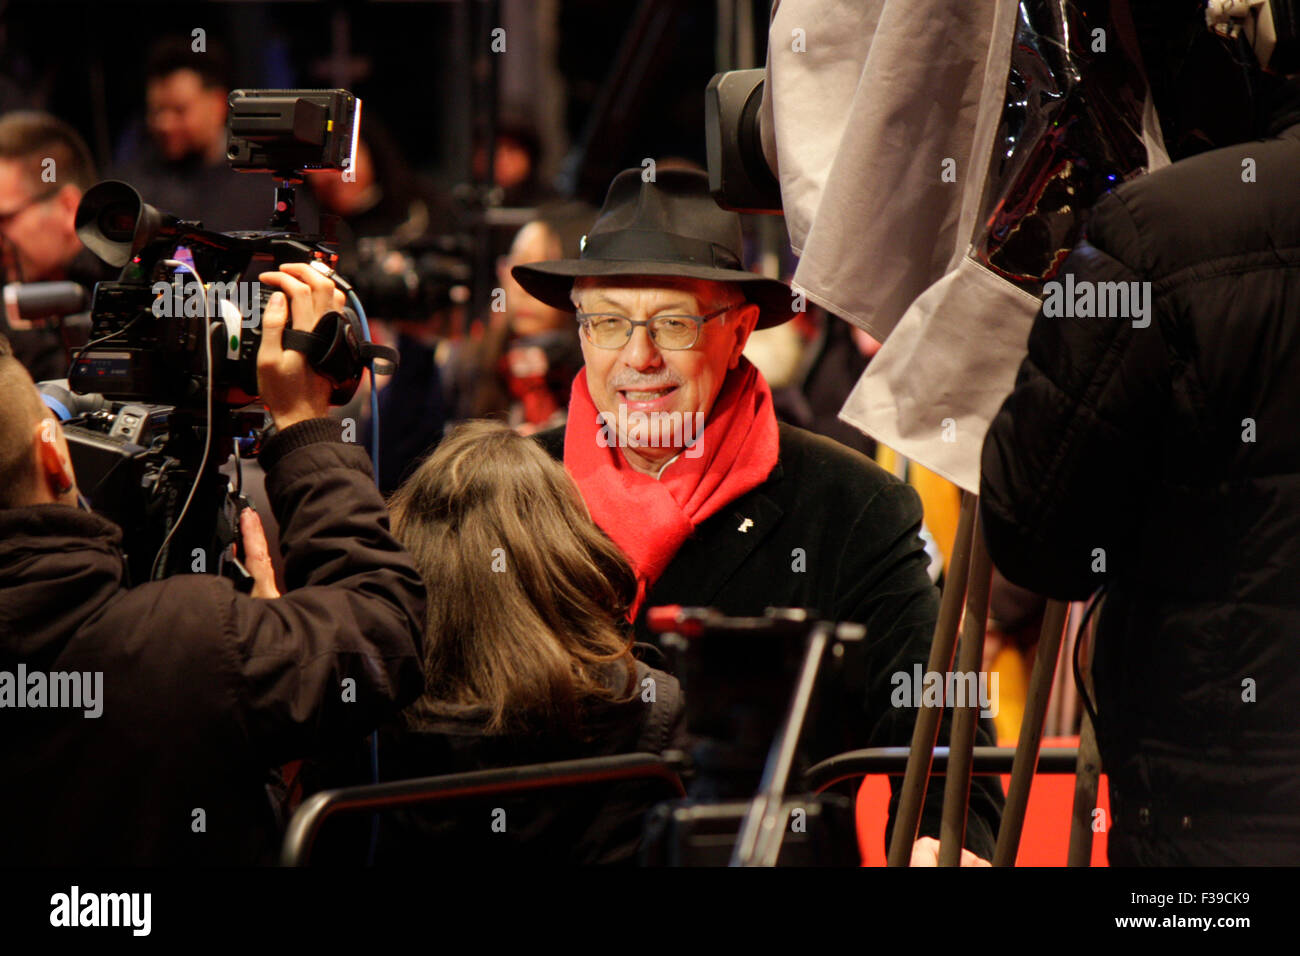 Dieter Kosslick - Berlinale 2014, Berlinale Palast, Februar 2014, Berlin. - Stock Image